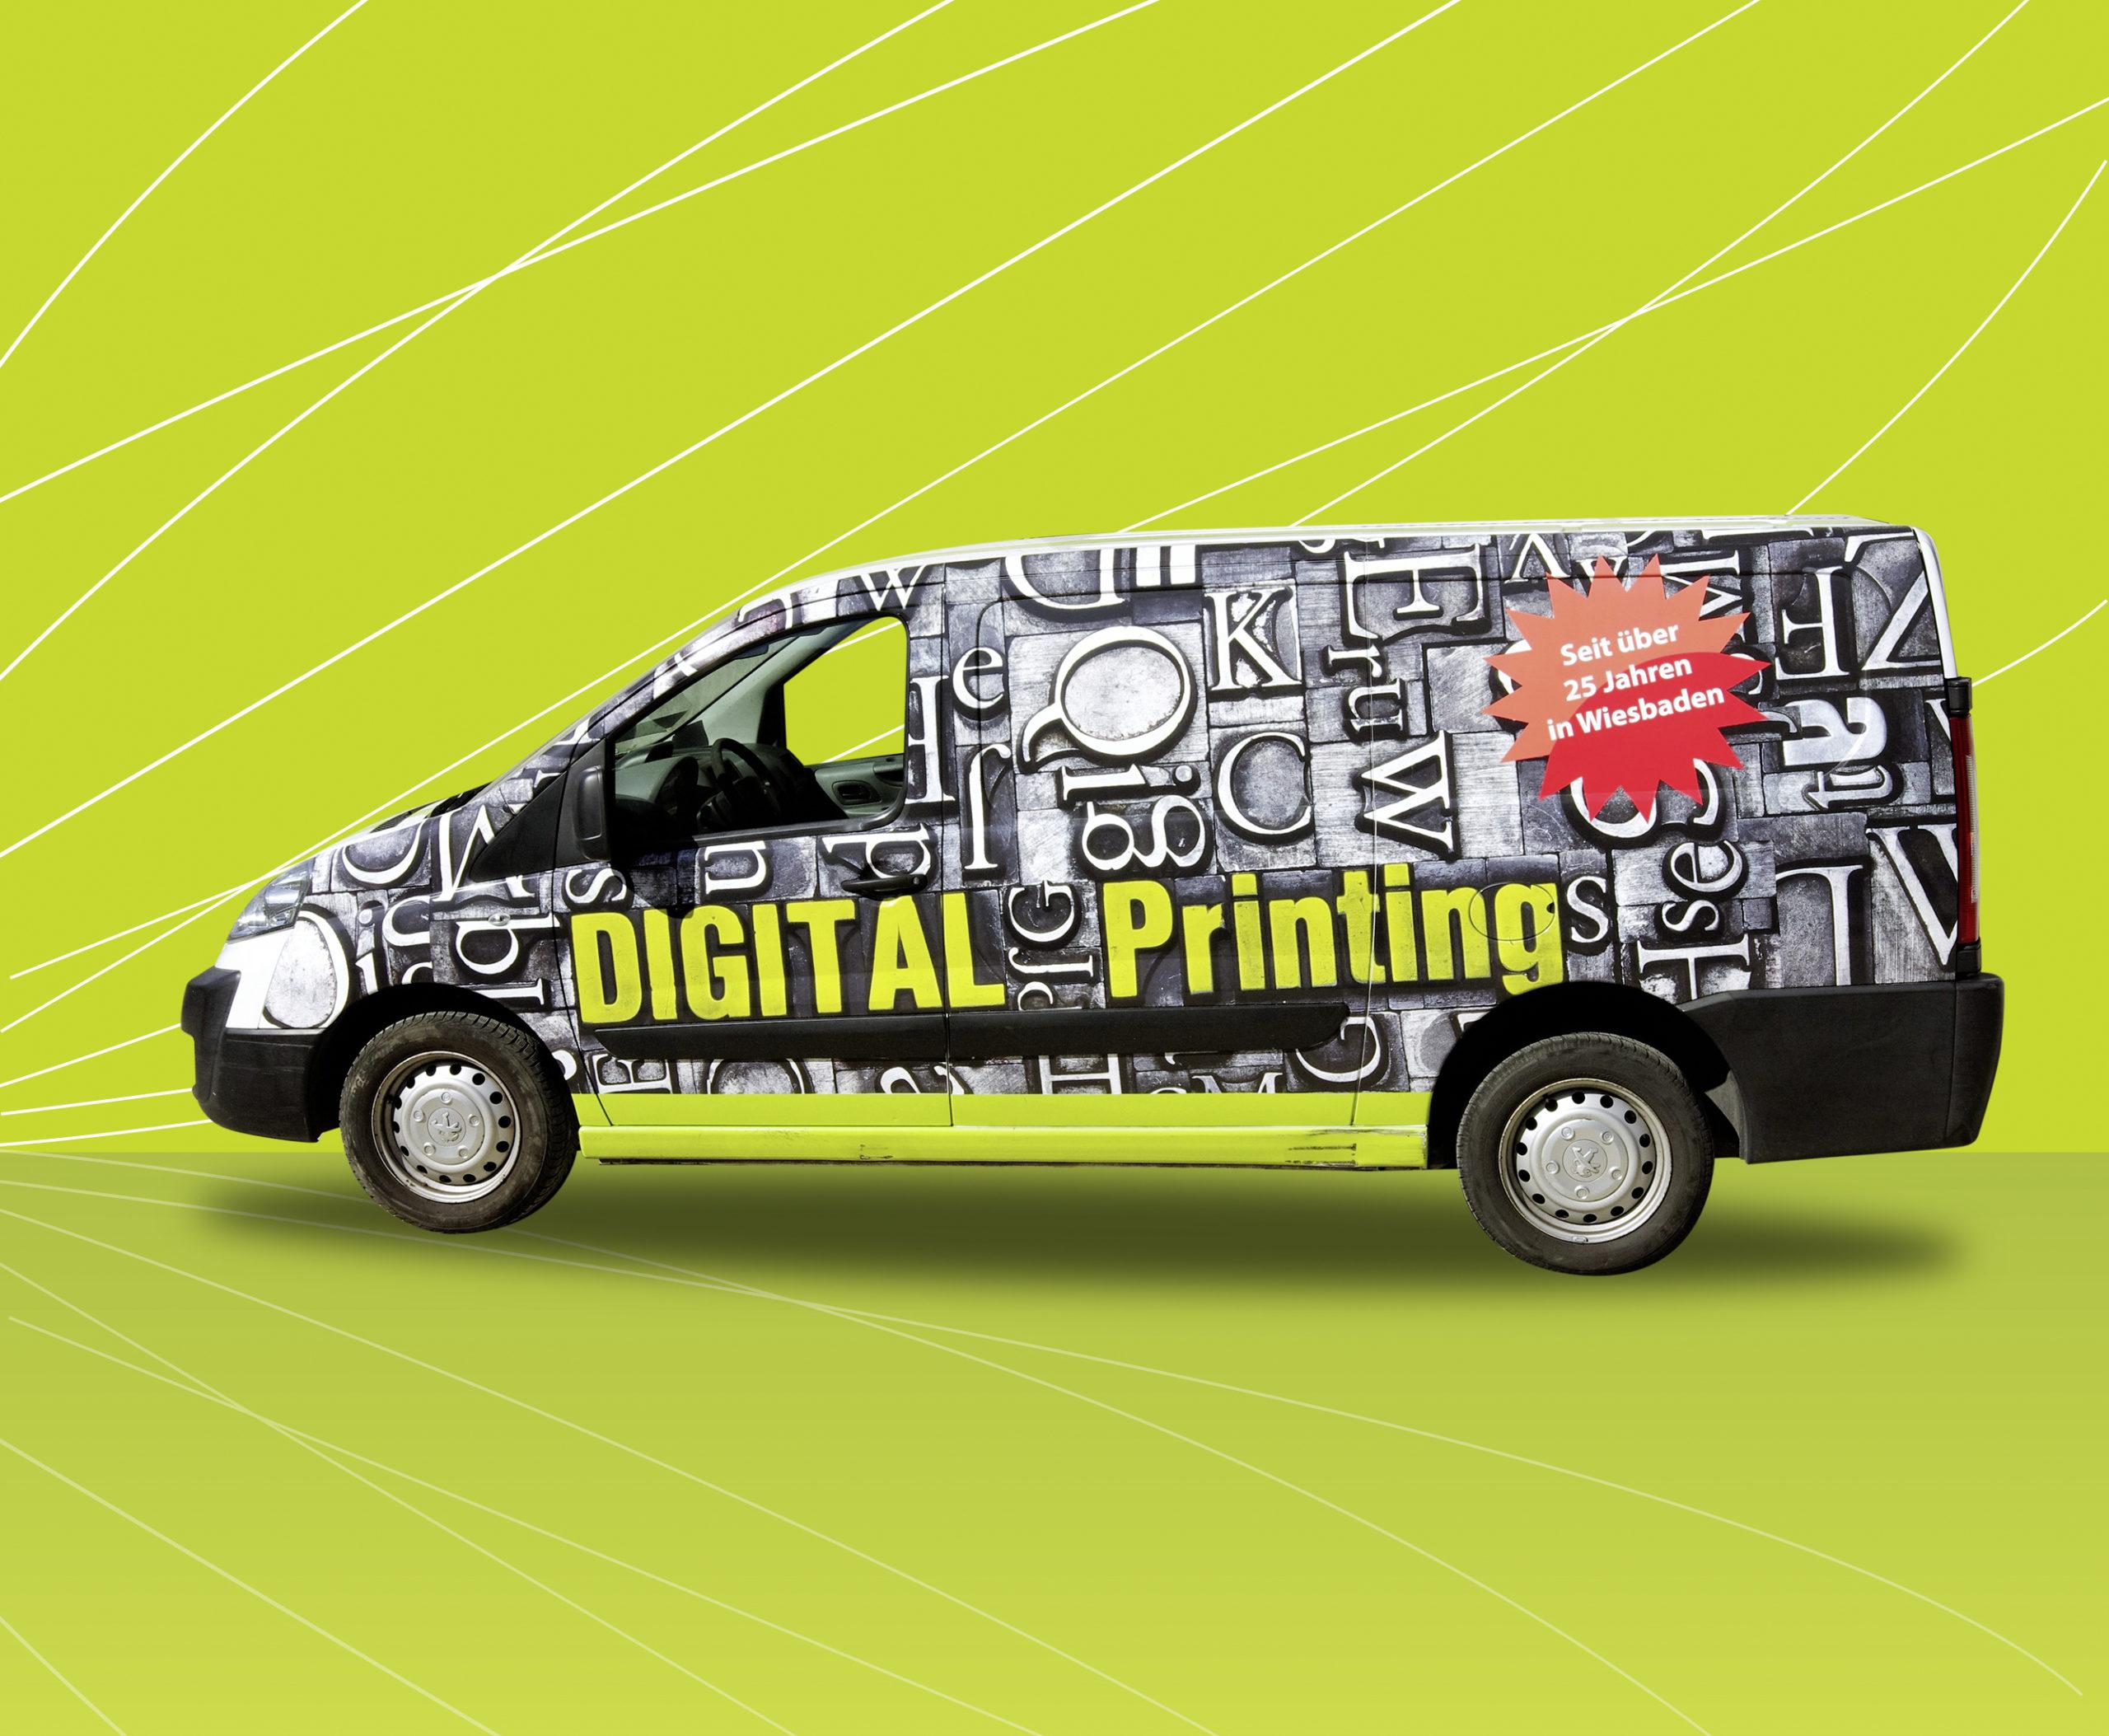 Fahrzeugbeschriftung Digital Printing Bus